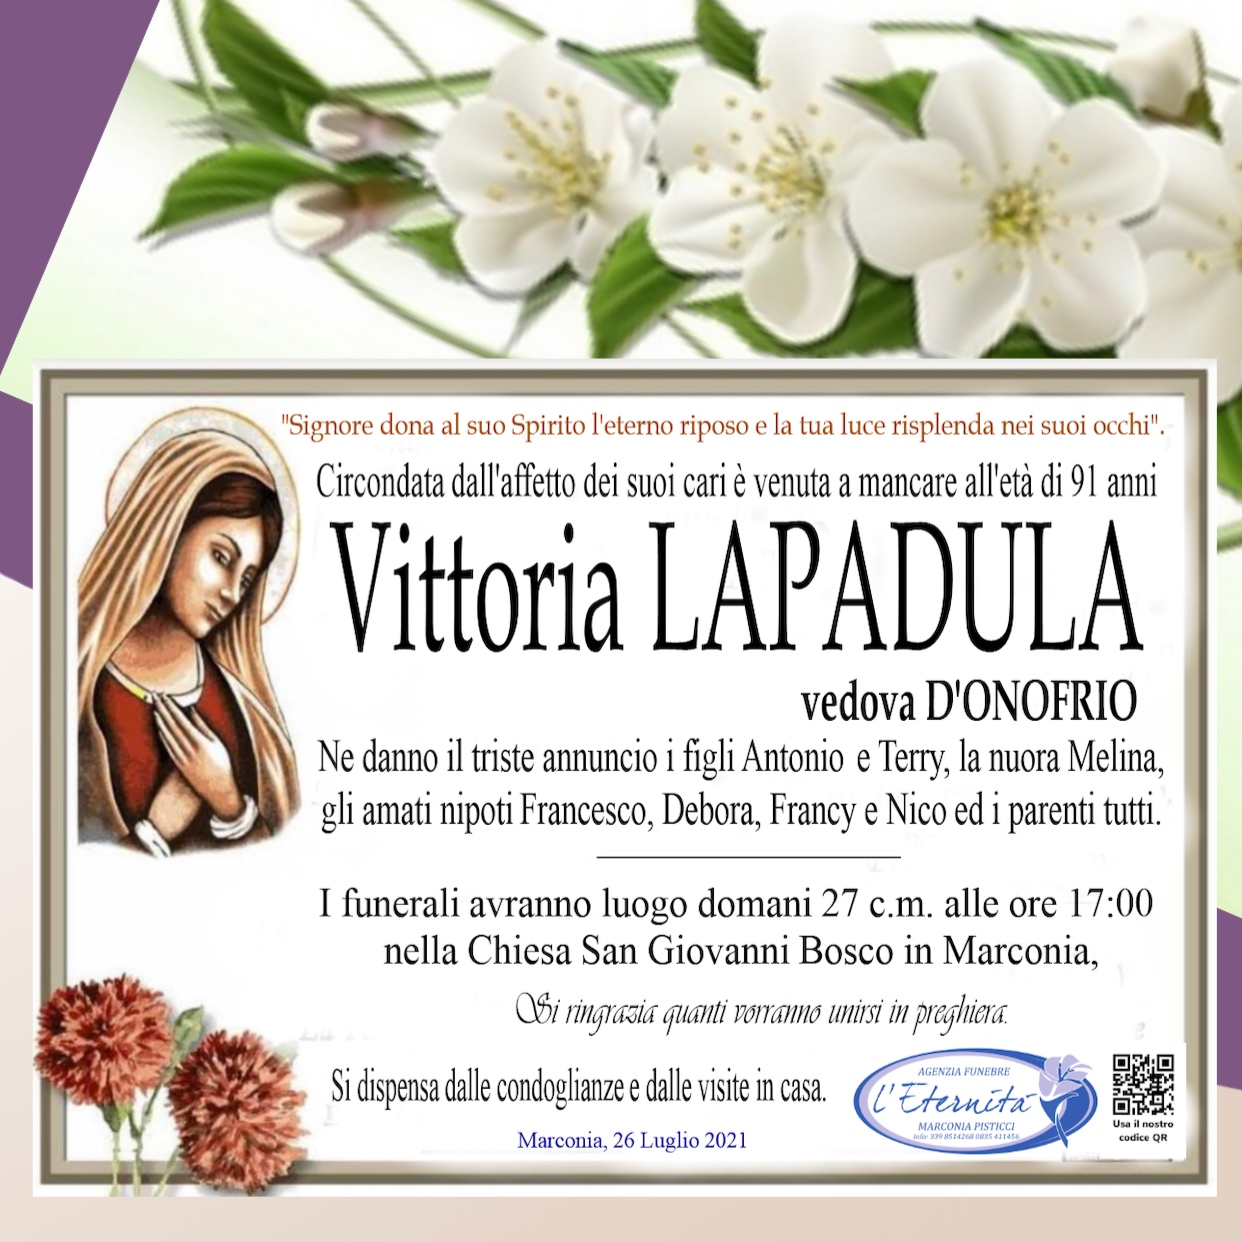 Vittoria LAPADULA